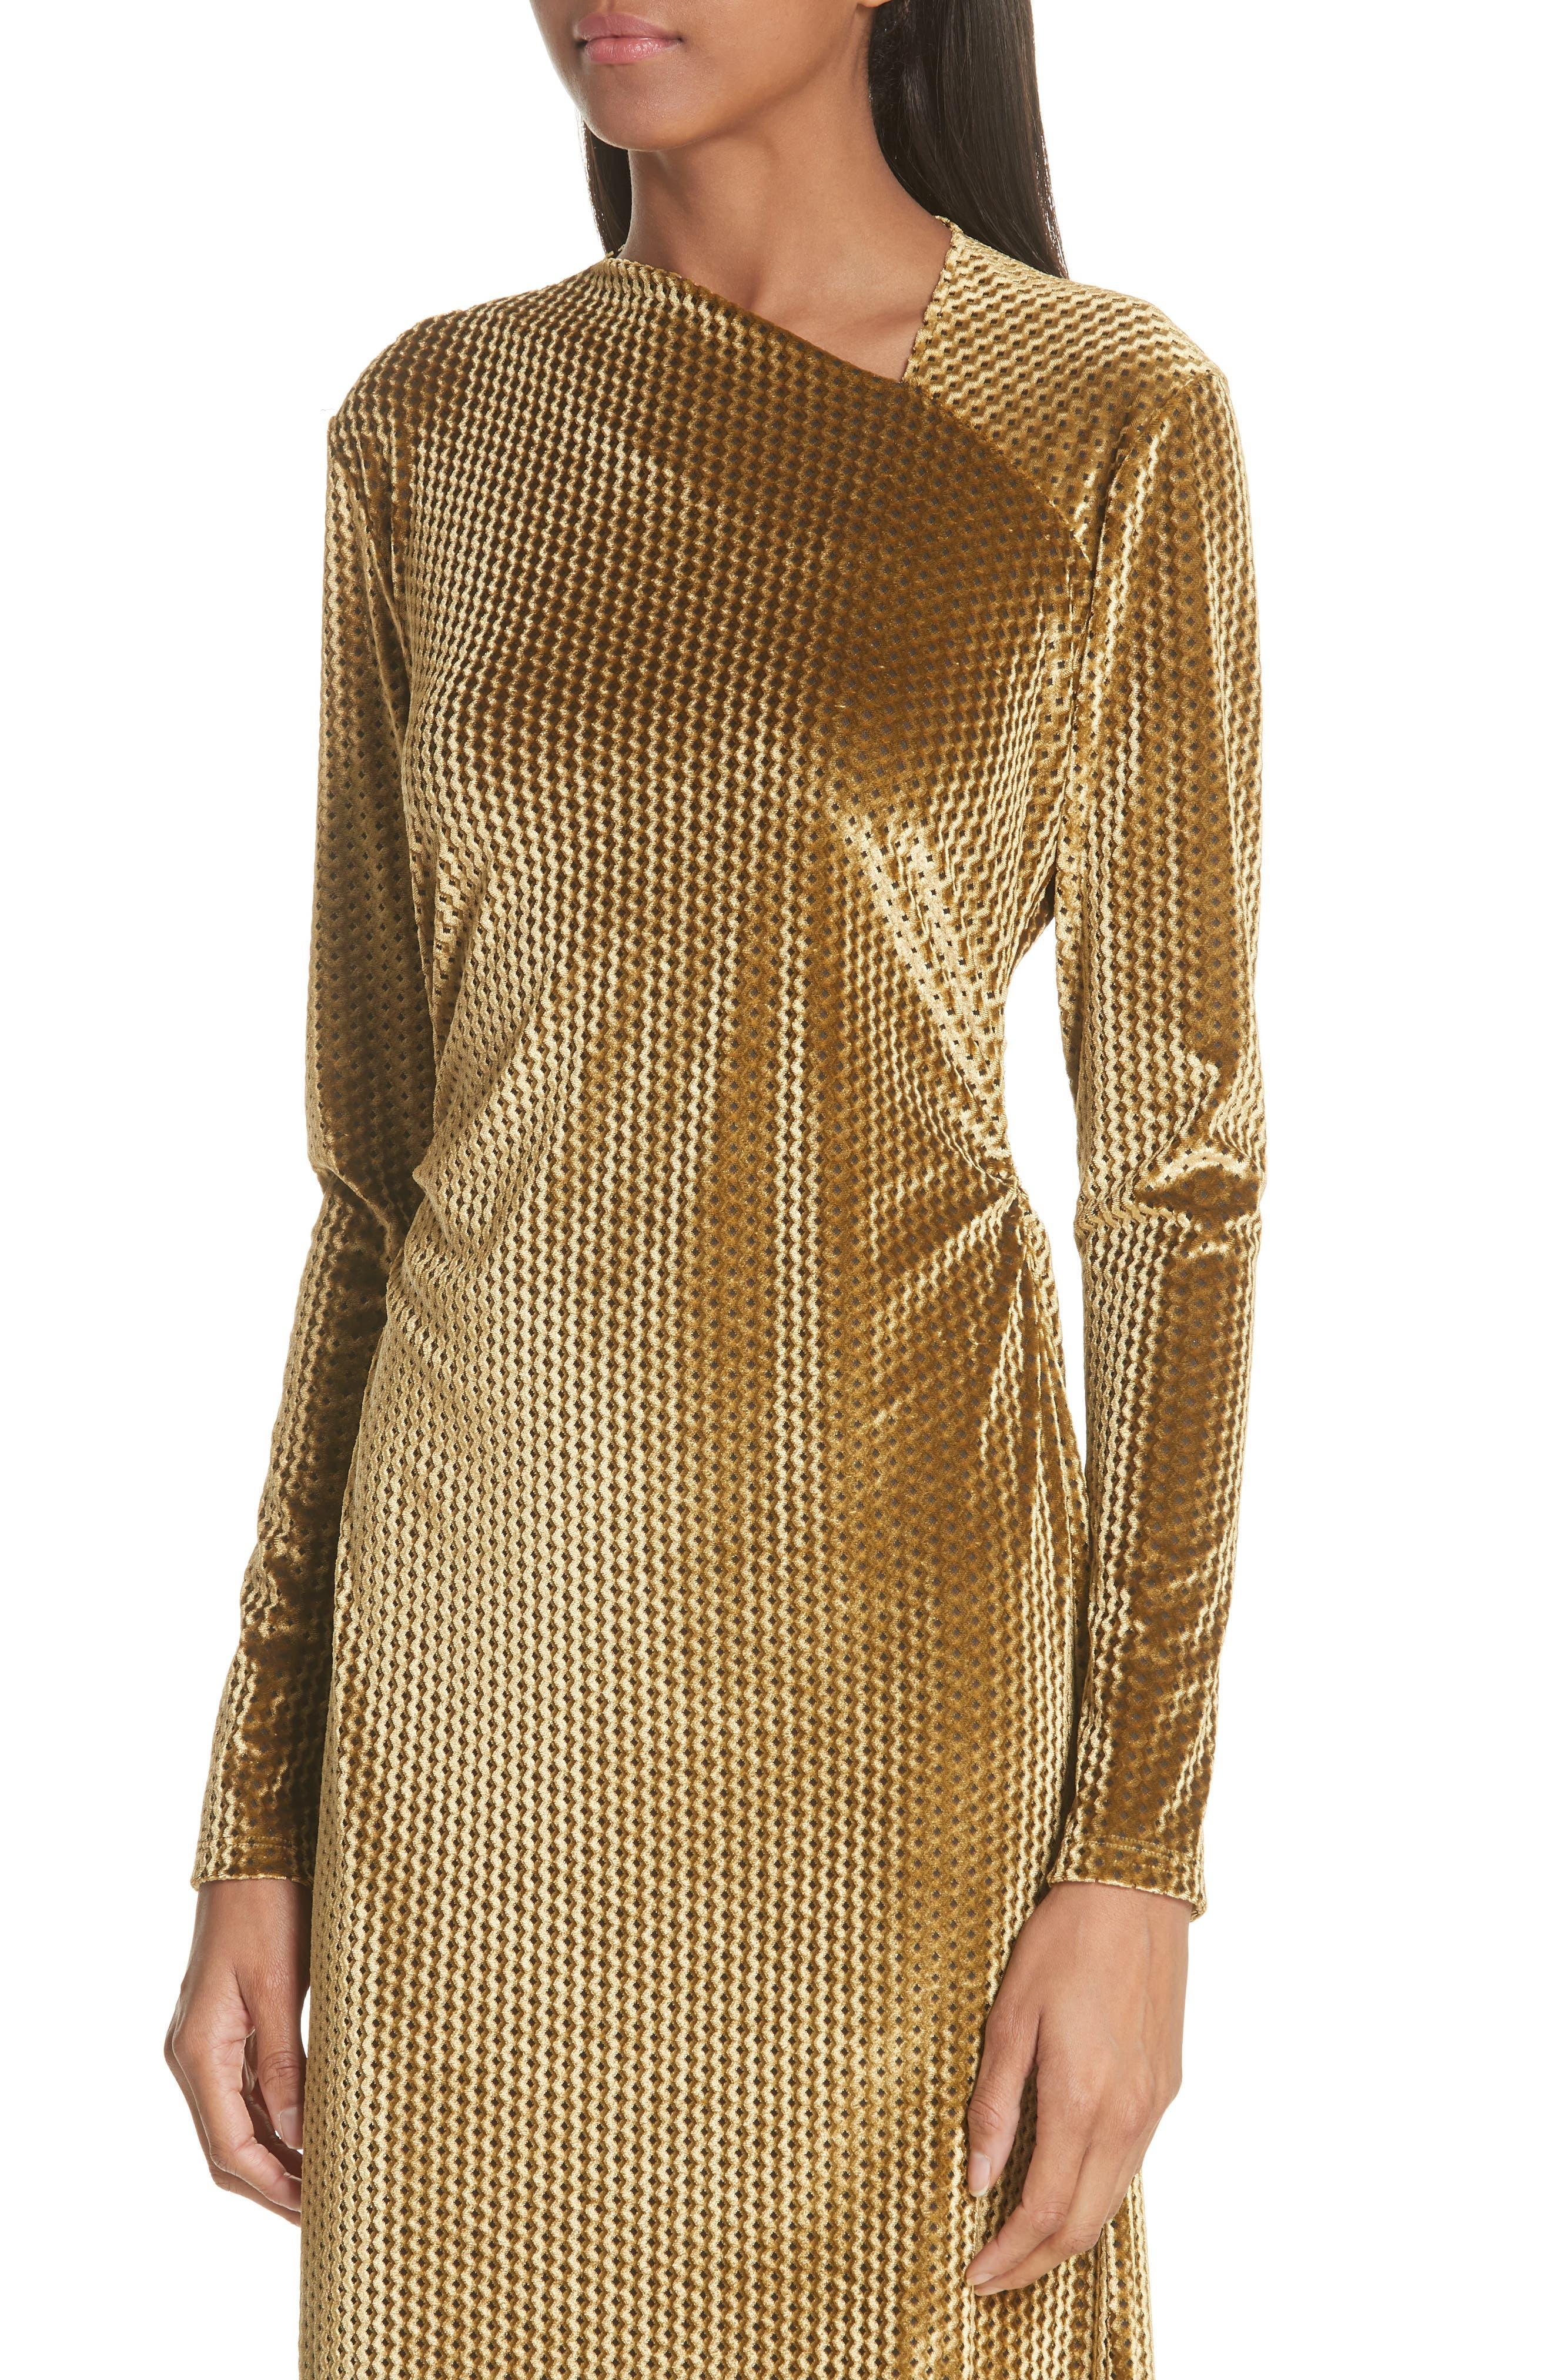 Ruched Velvet Jacquard Midi Dress,                             Alternate thumbnail 4, color,                             GOLD